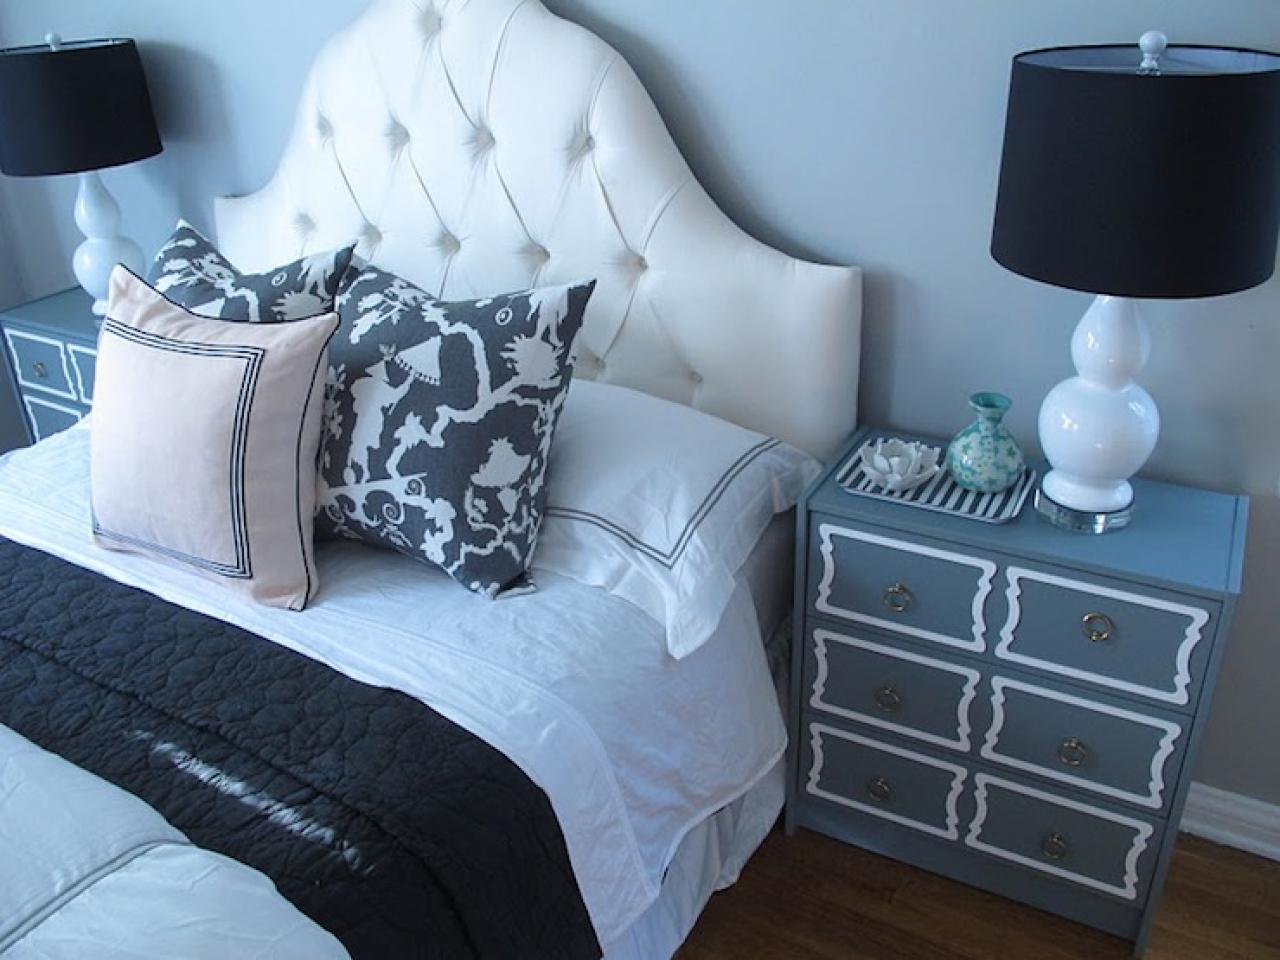 Dorothy draper bedroom teal black headboard chandelier black and white 1280x960